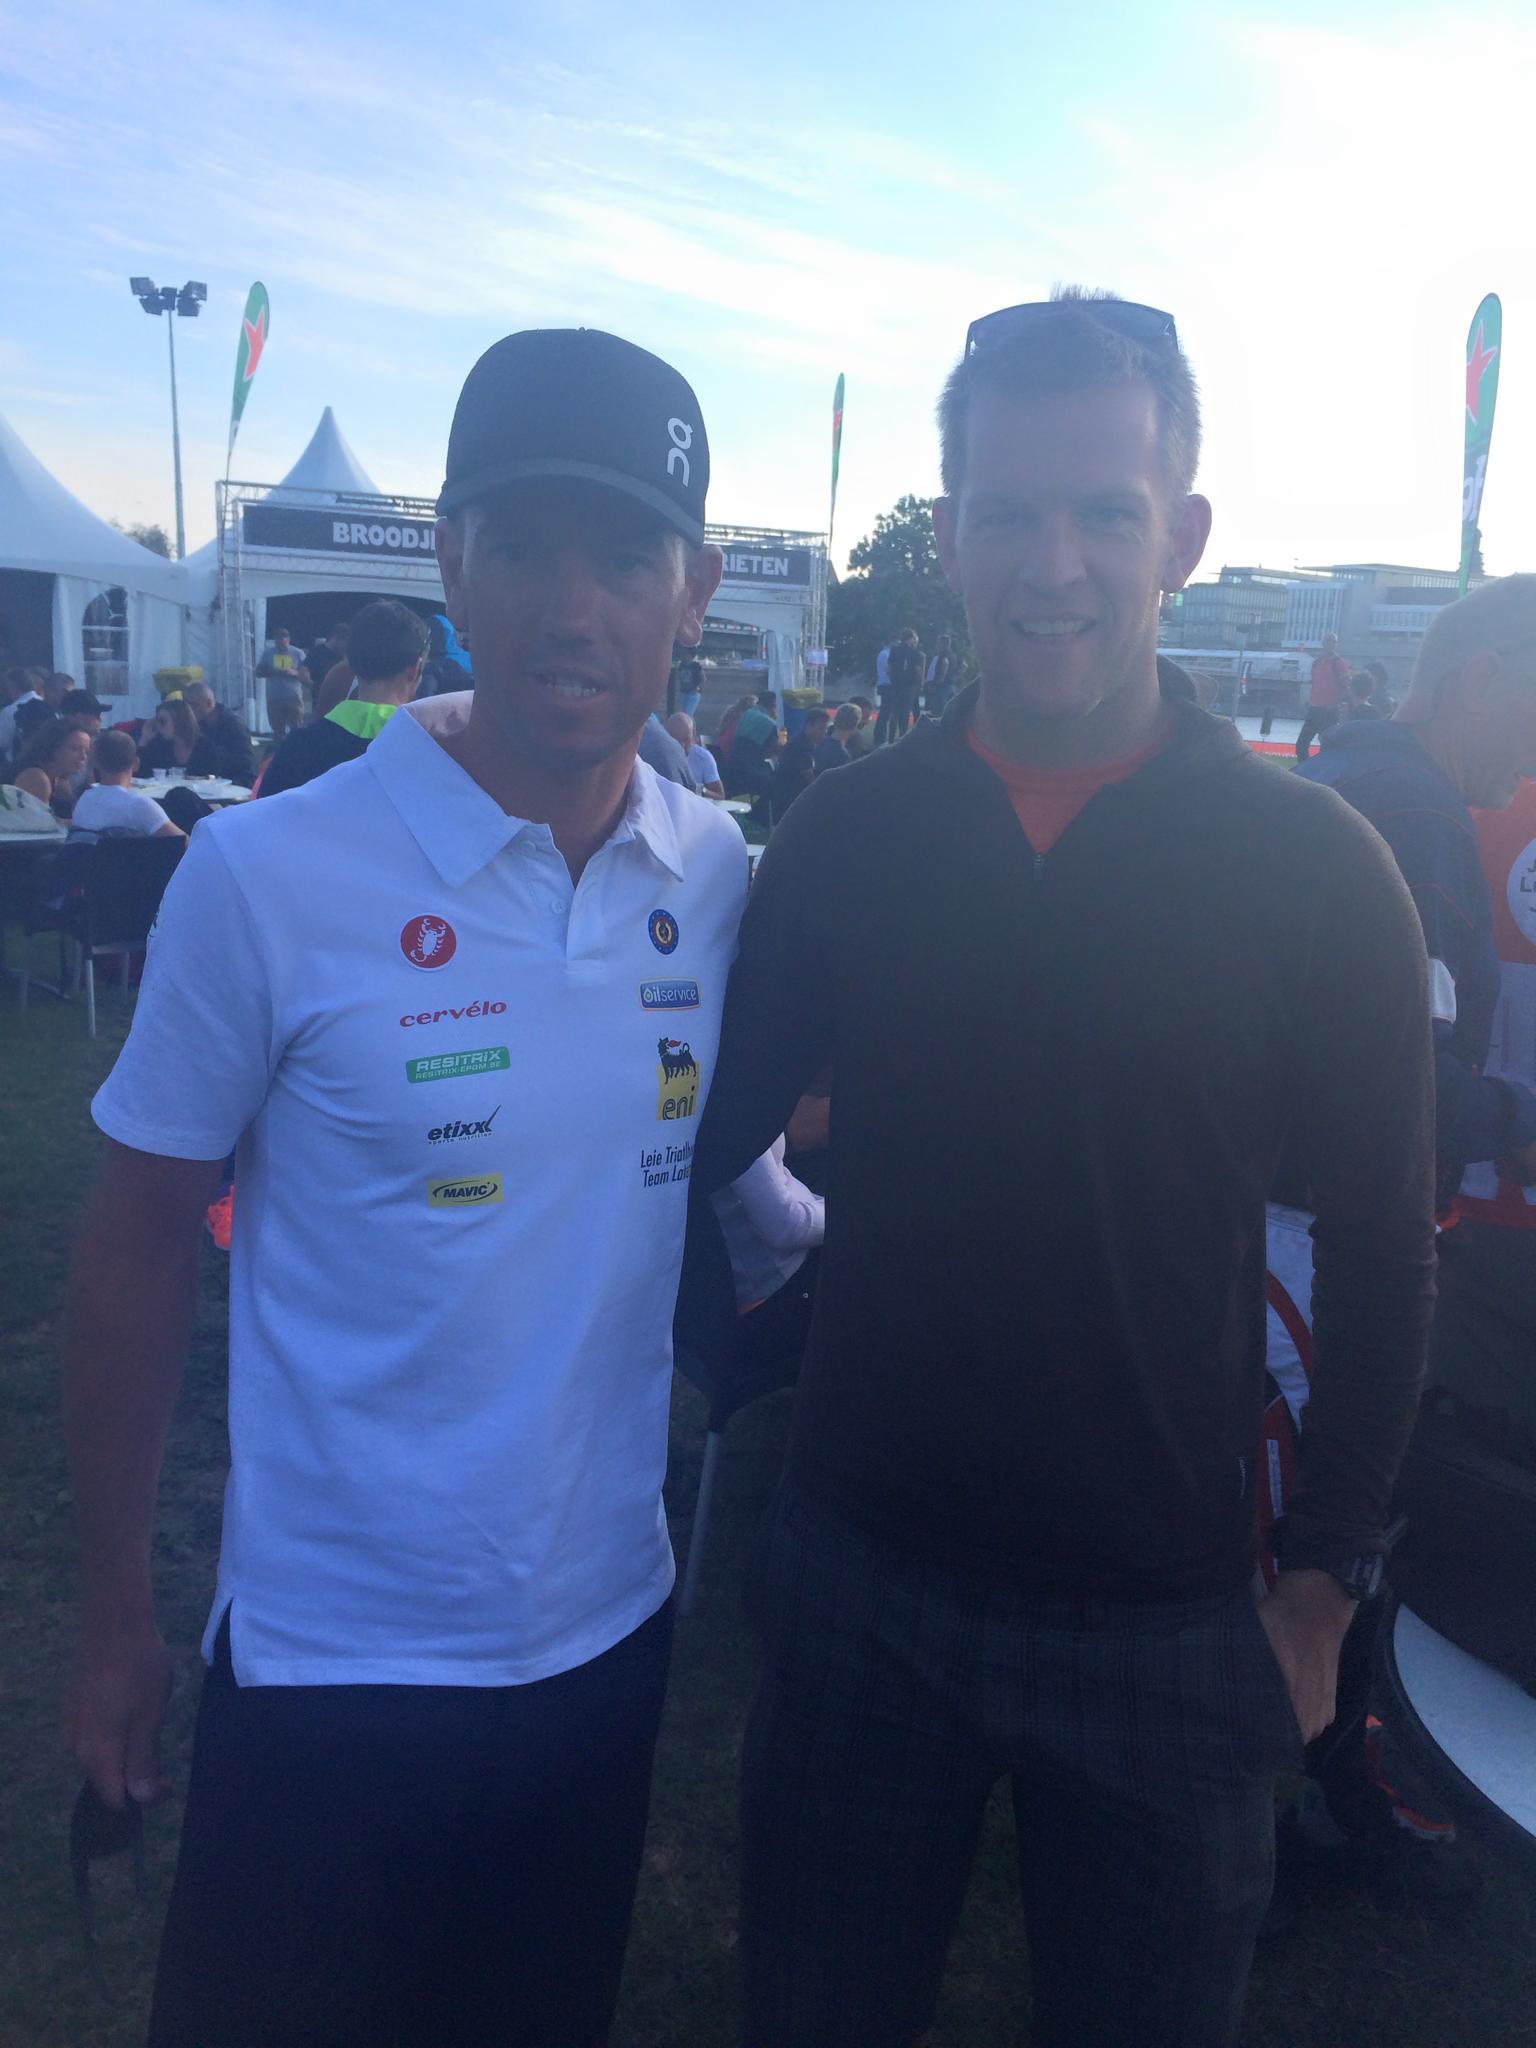 With 2013 Ironman World Champion Frederik van Lierde pre-race